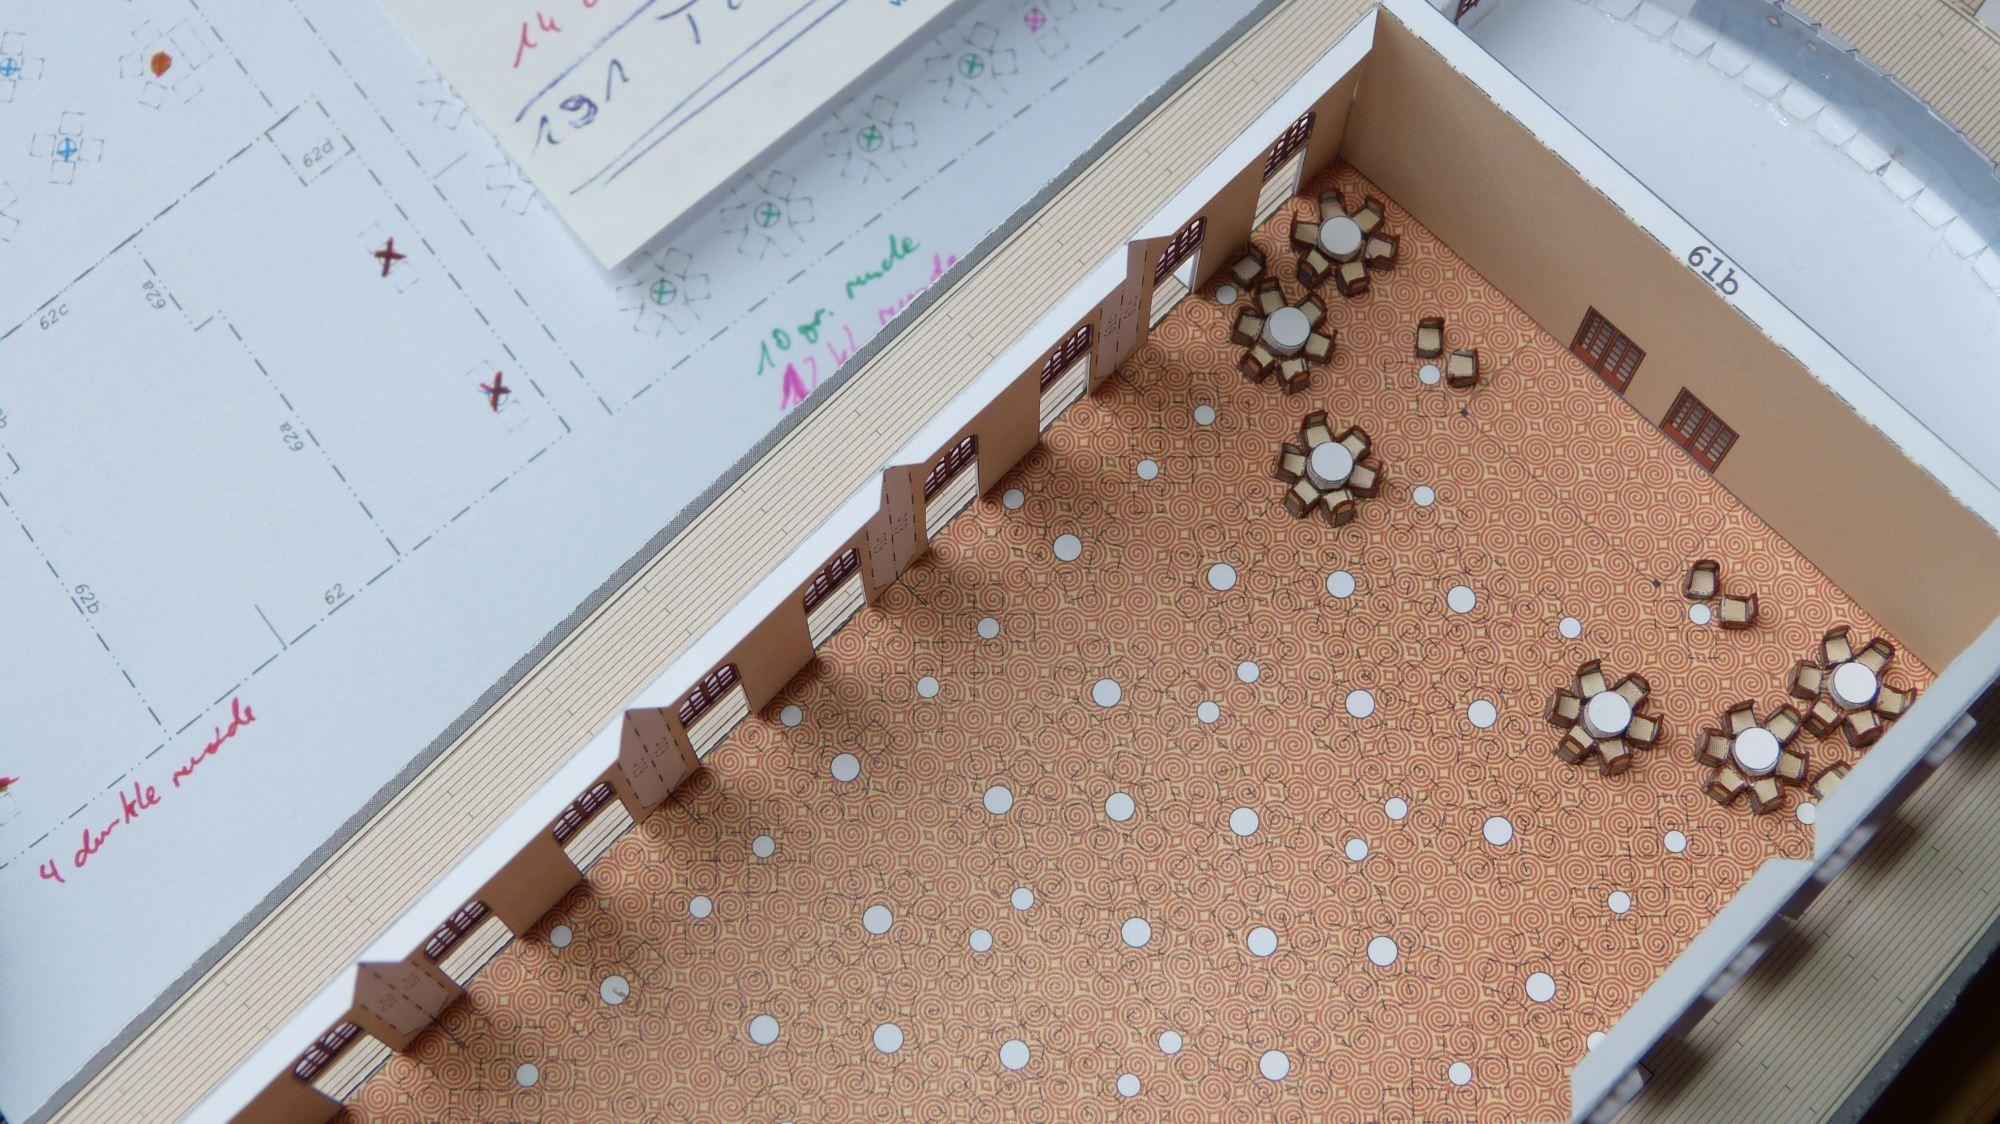 kartonmodellbau von jabietz blog archive cap arcona. Black Bedroom Furniture Sets. Home Design Ideas